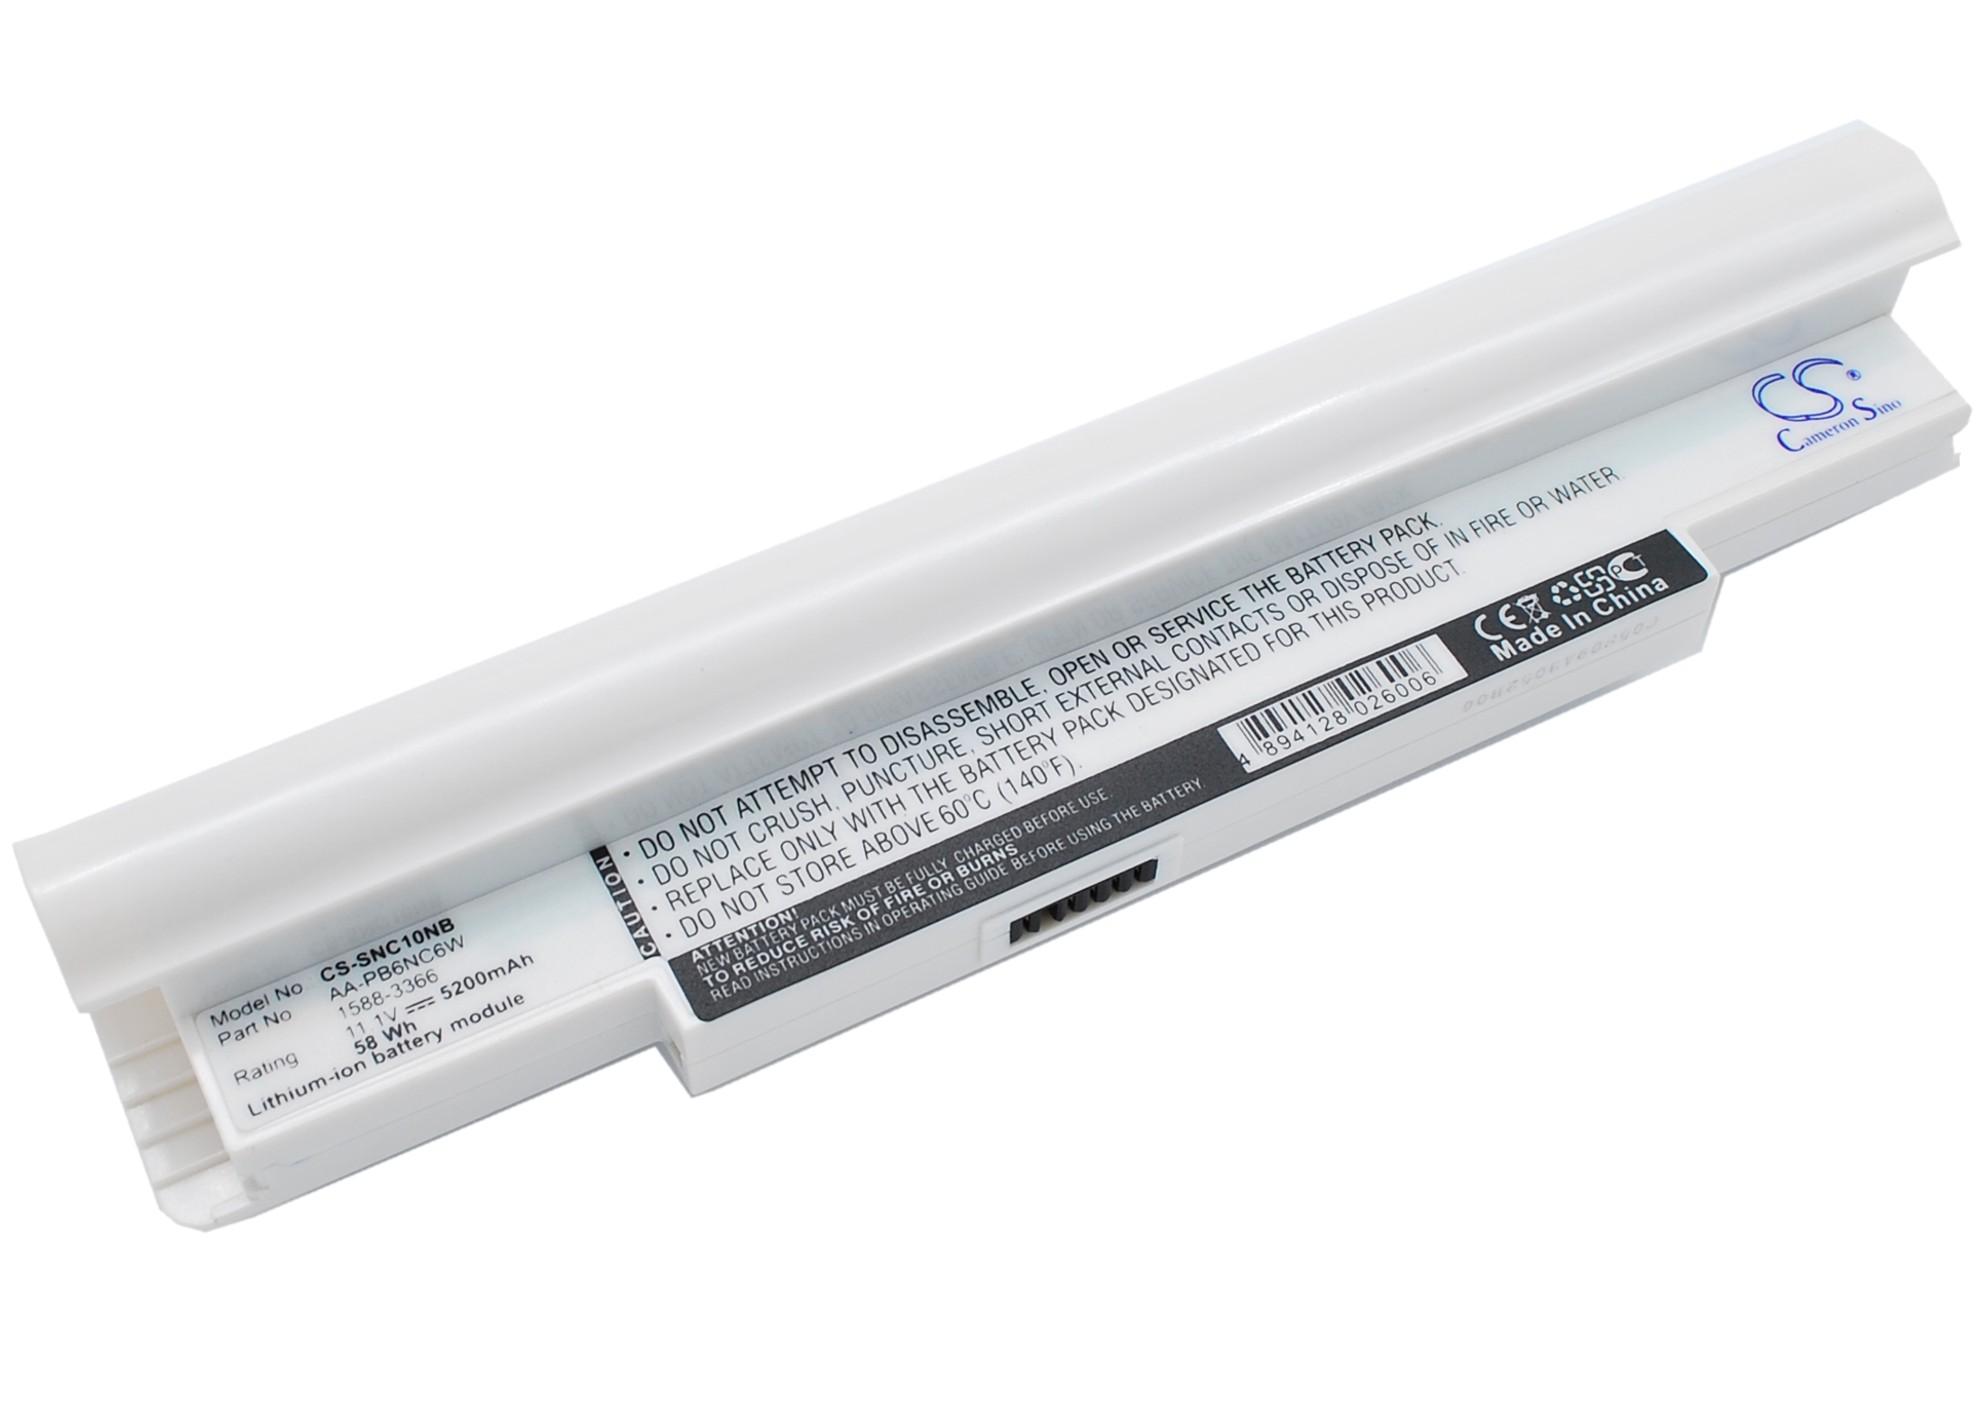 Cameron Sino baterie do notebooků pro SAMSUNG NP-NC10-KA01DE/SEG 11.1V Li-ion 5200mAh bílá - neoriginální